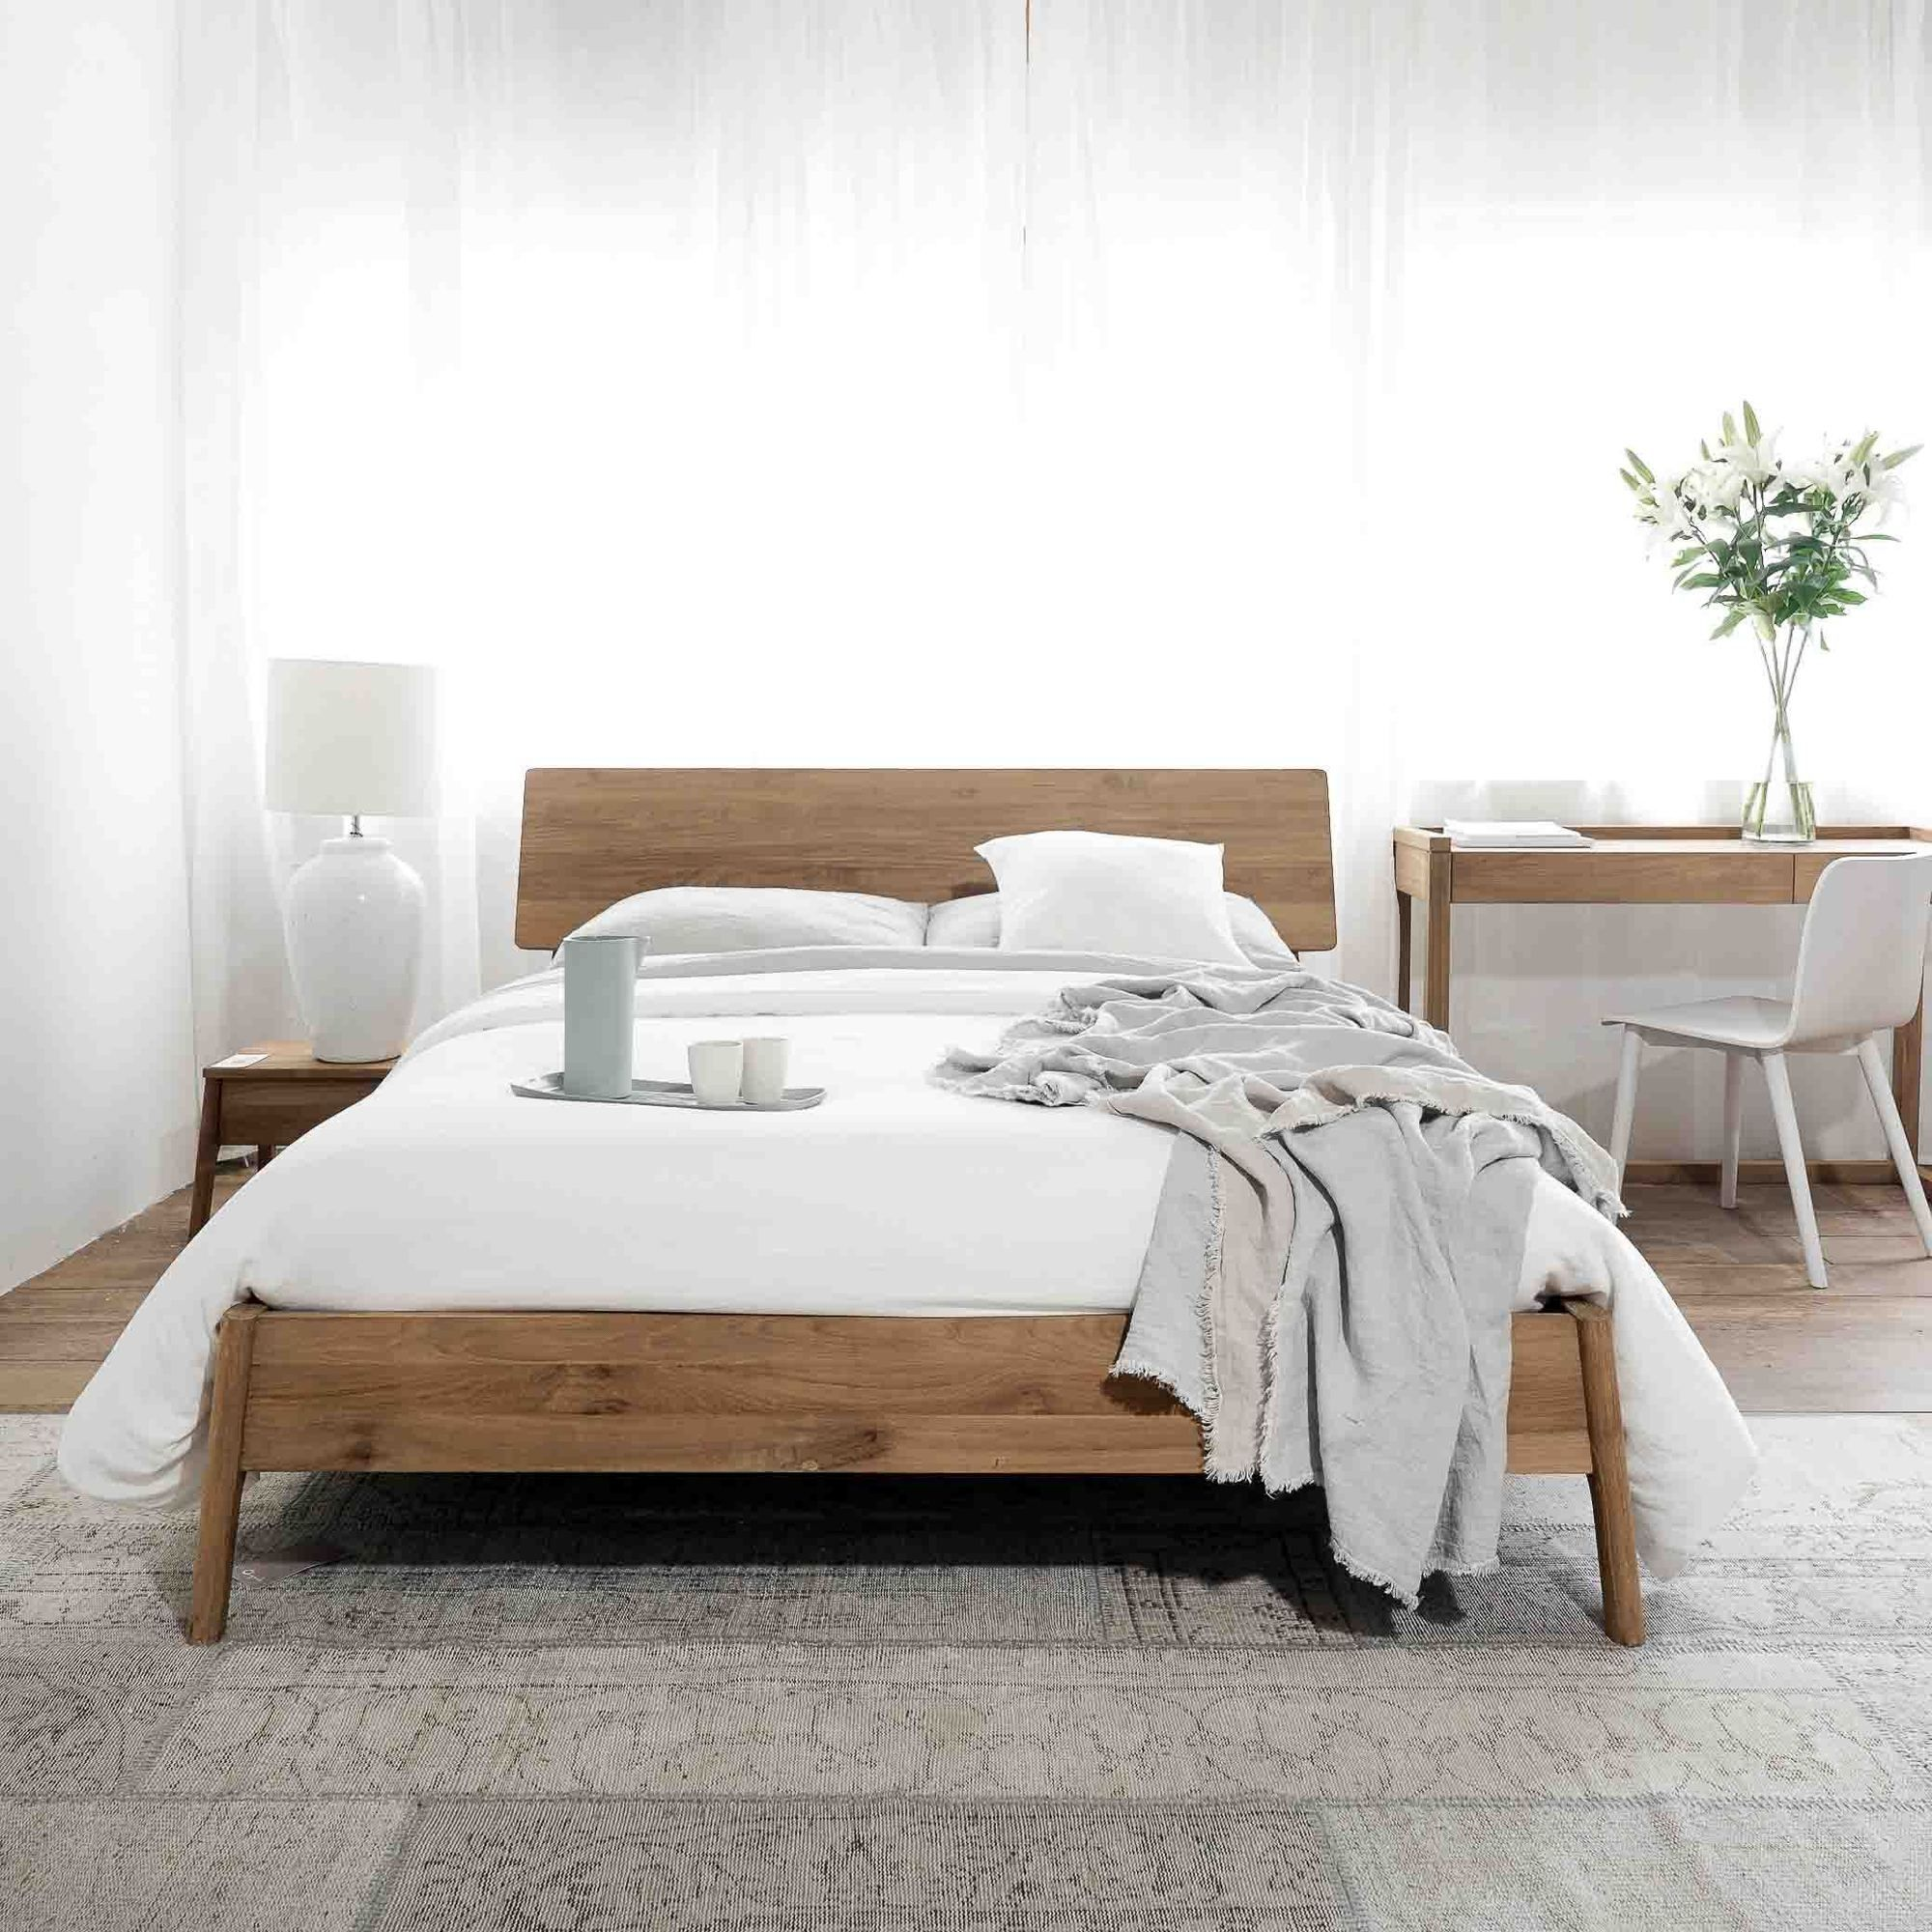 Teak Bed Frame Air Bed Australia Size In 2020 Beds Australia